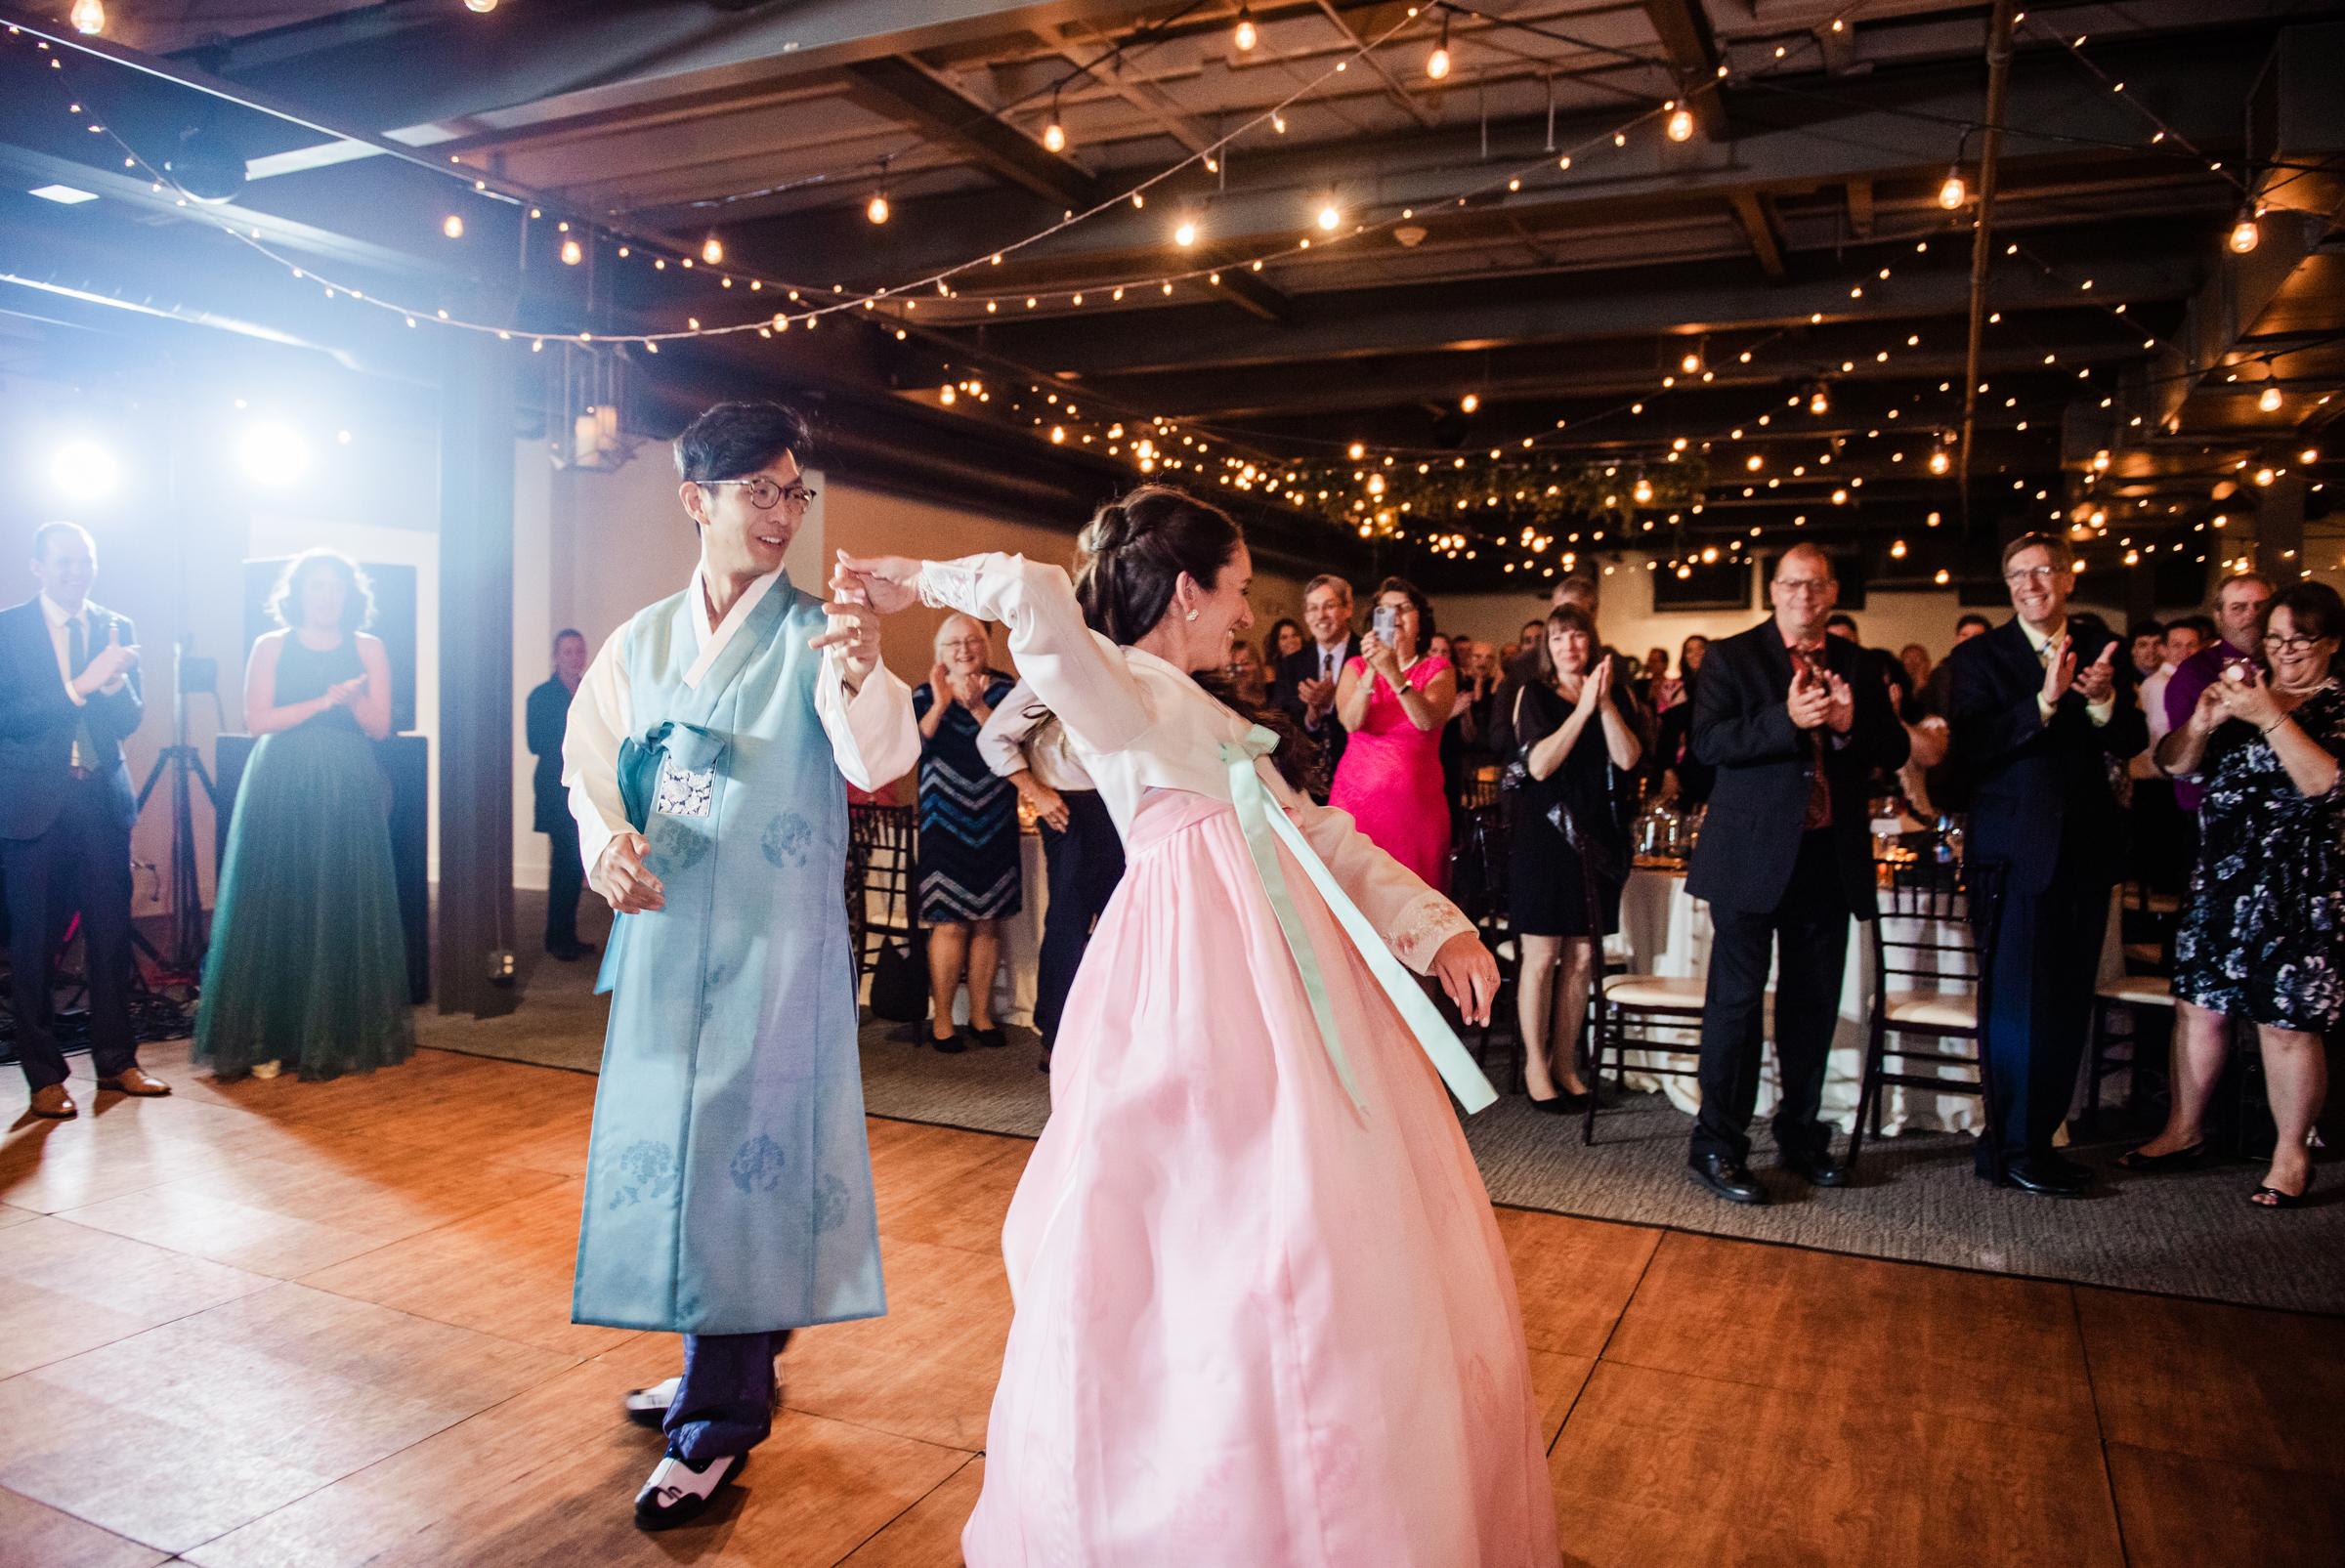 SKY_Armory_Syracuse_Wedding_JILL_STUDIO_Rochester_NY_Photographer_DSC_6124.jpg